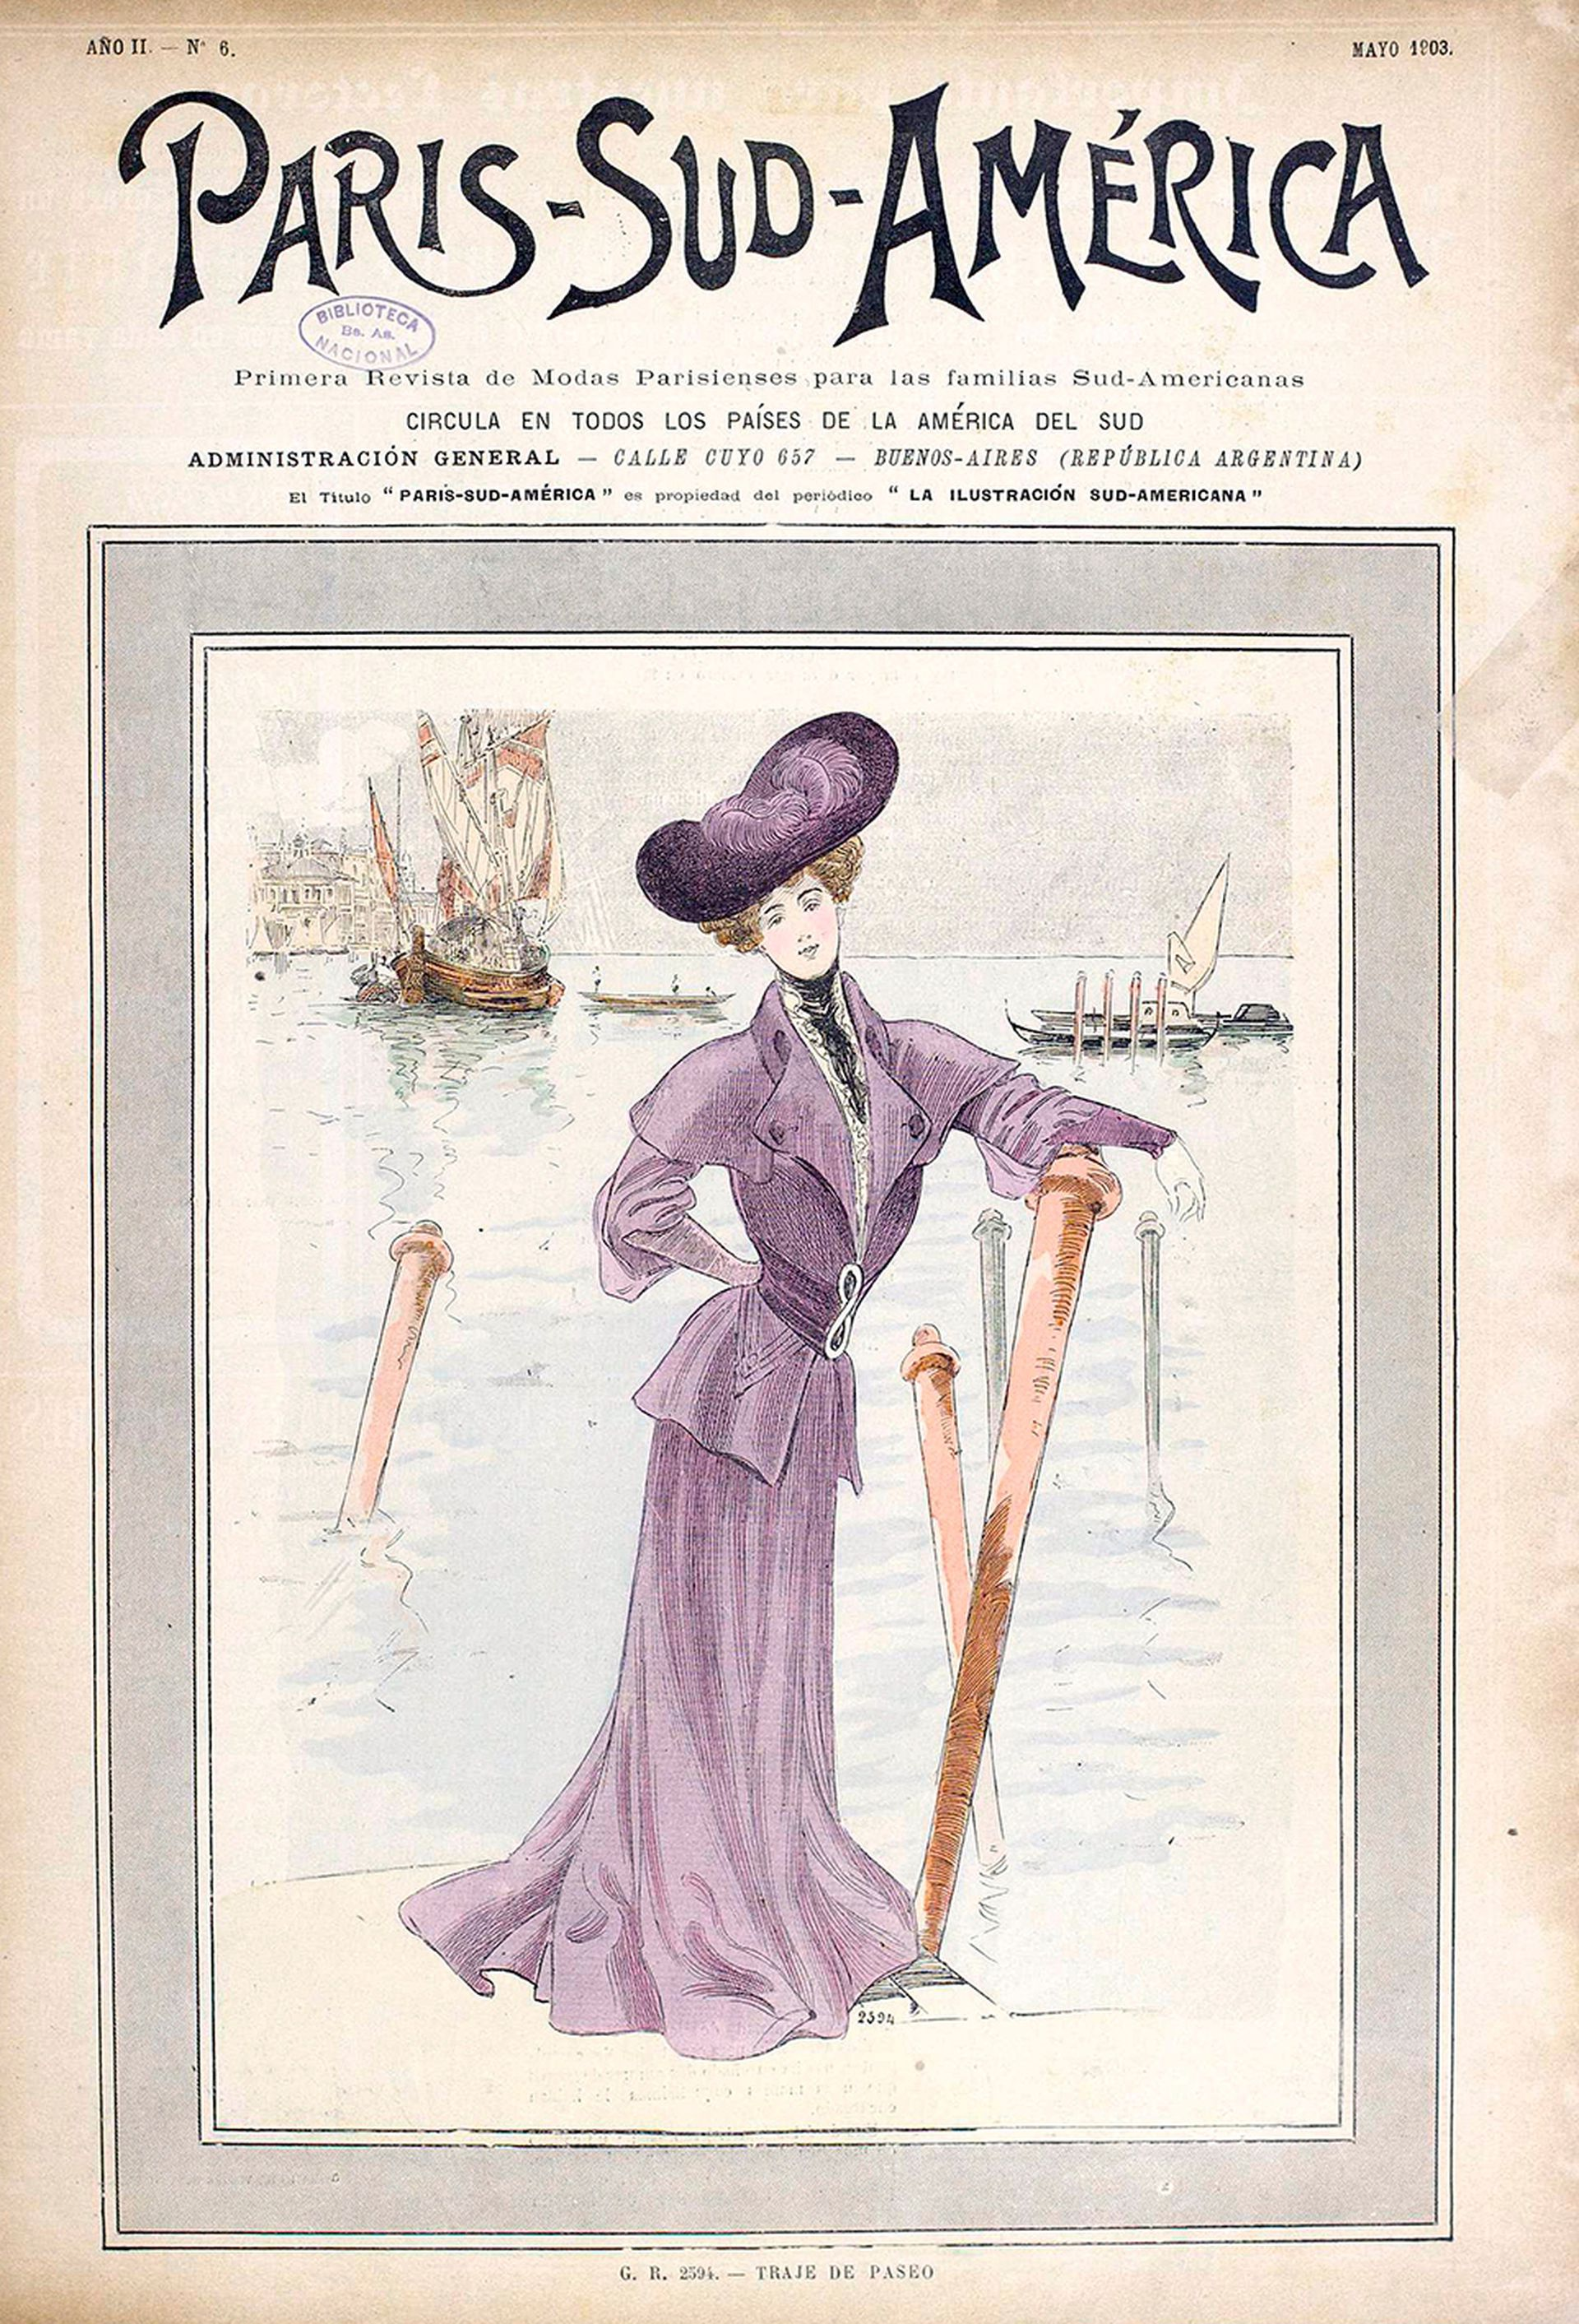 Tapa de la revista Paris-Sud-América de 1903.